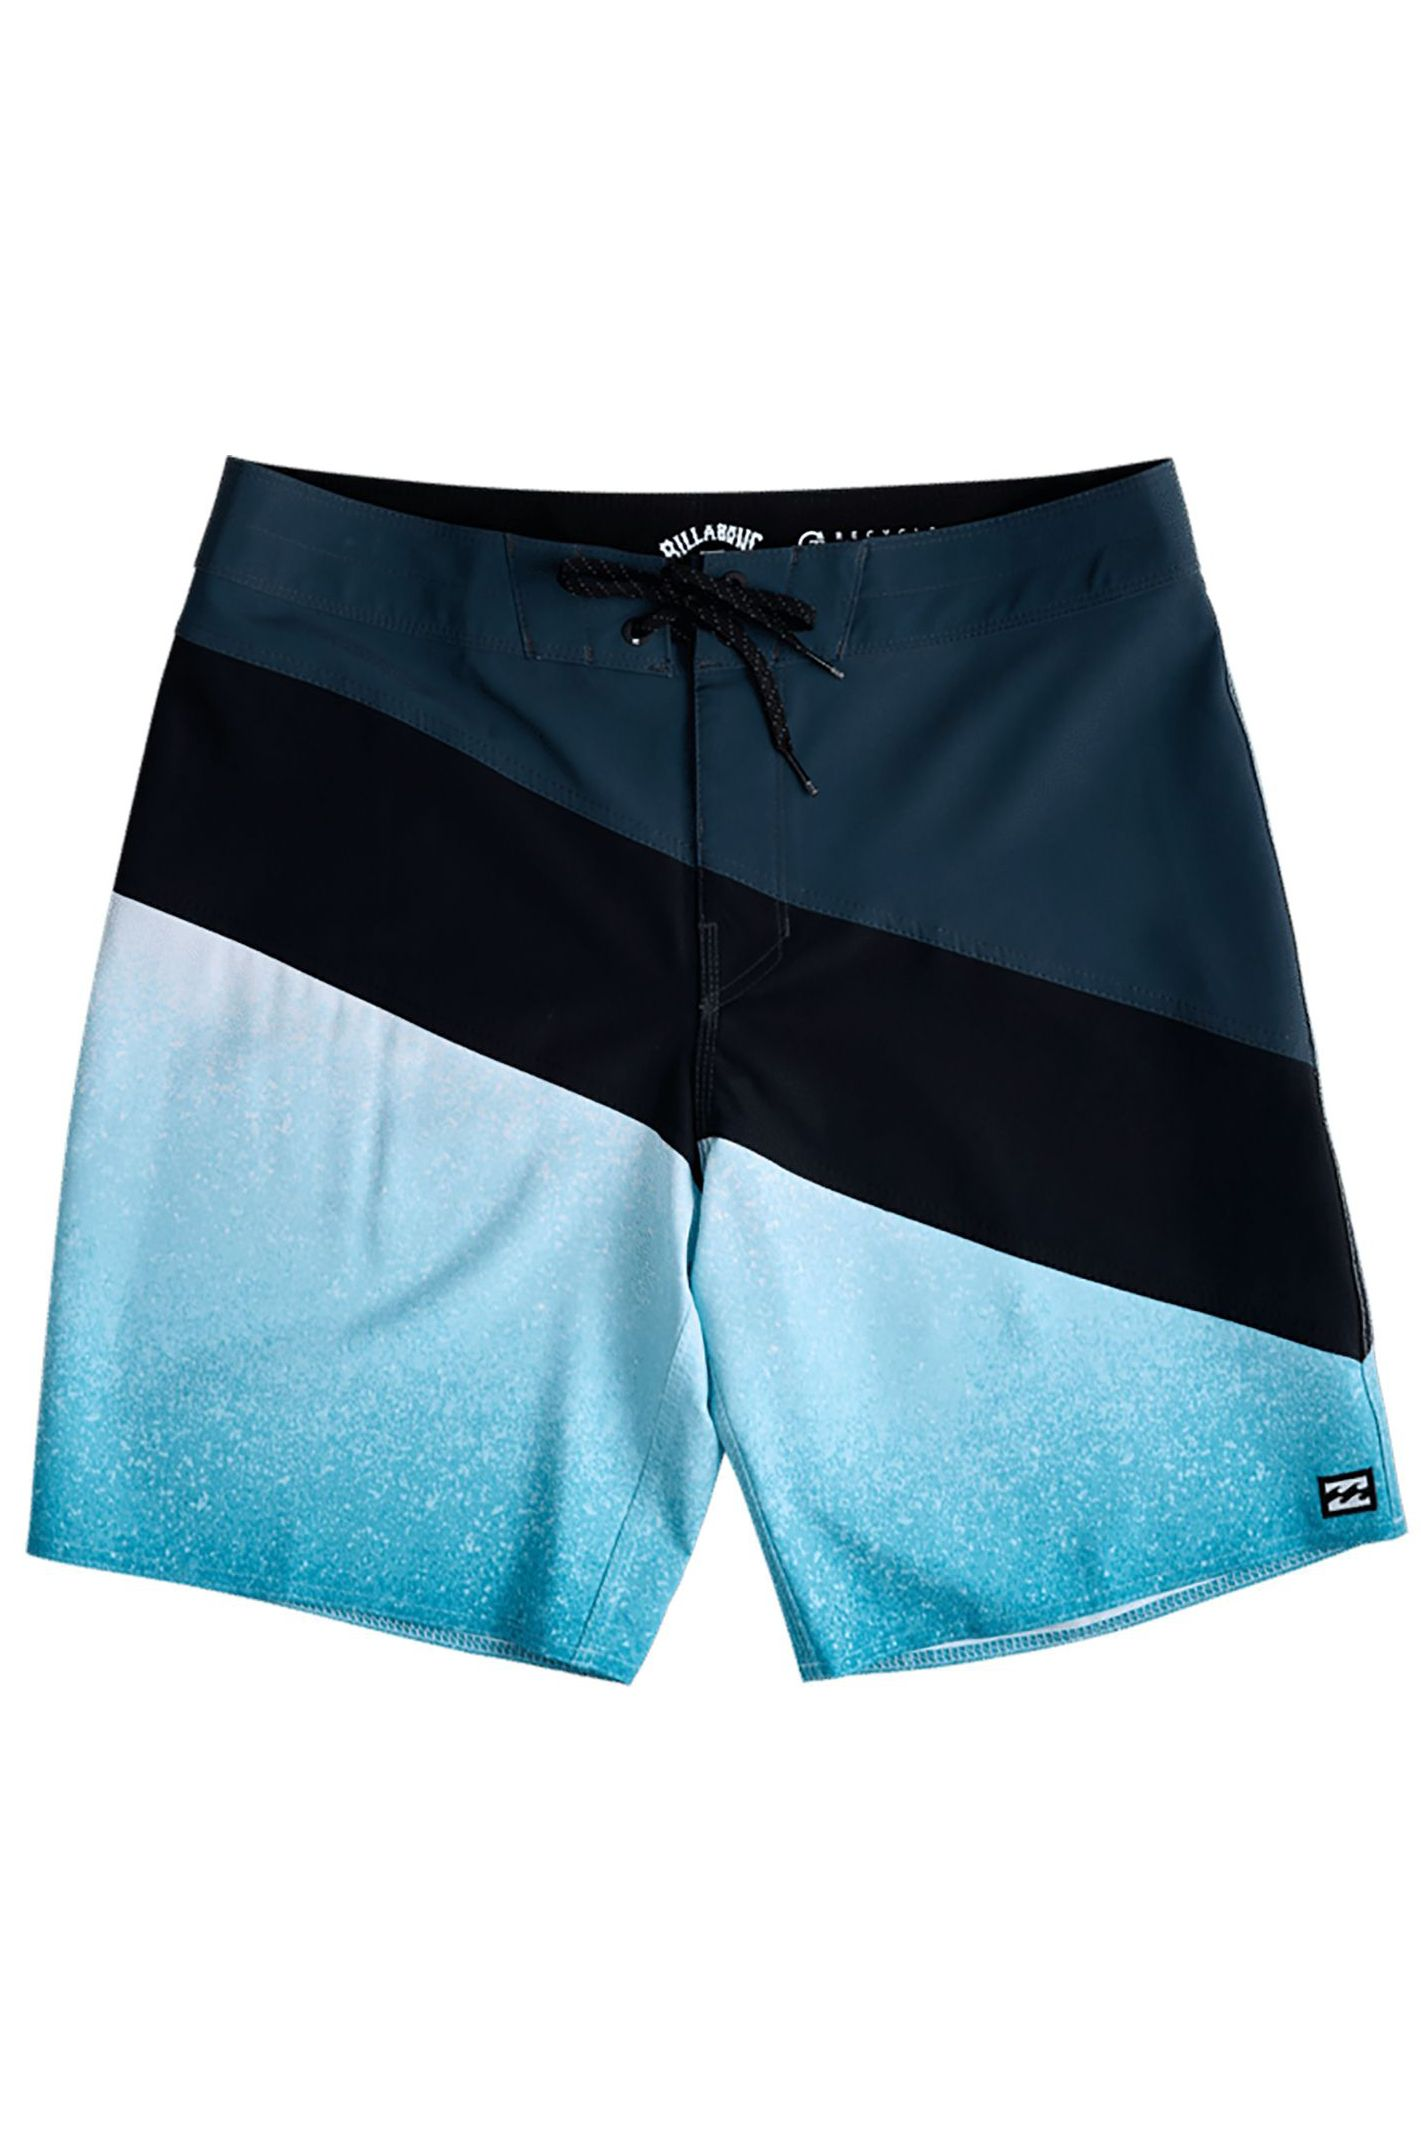 Billabong Boardshorts T STREET PRO Aqua